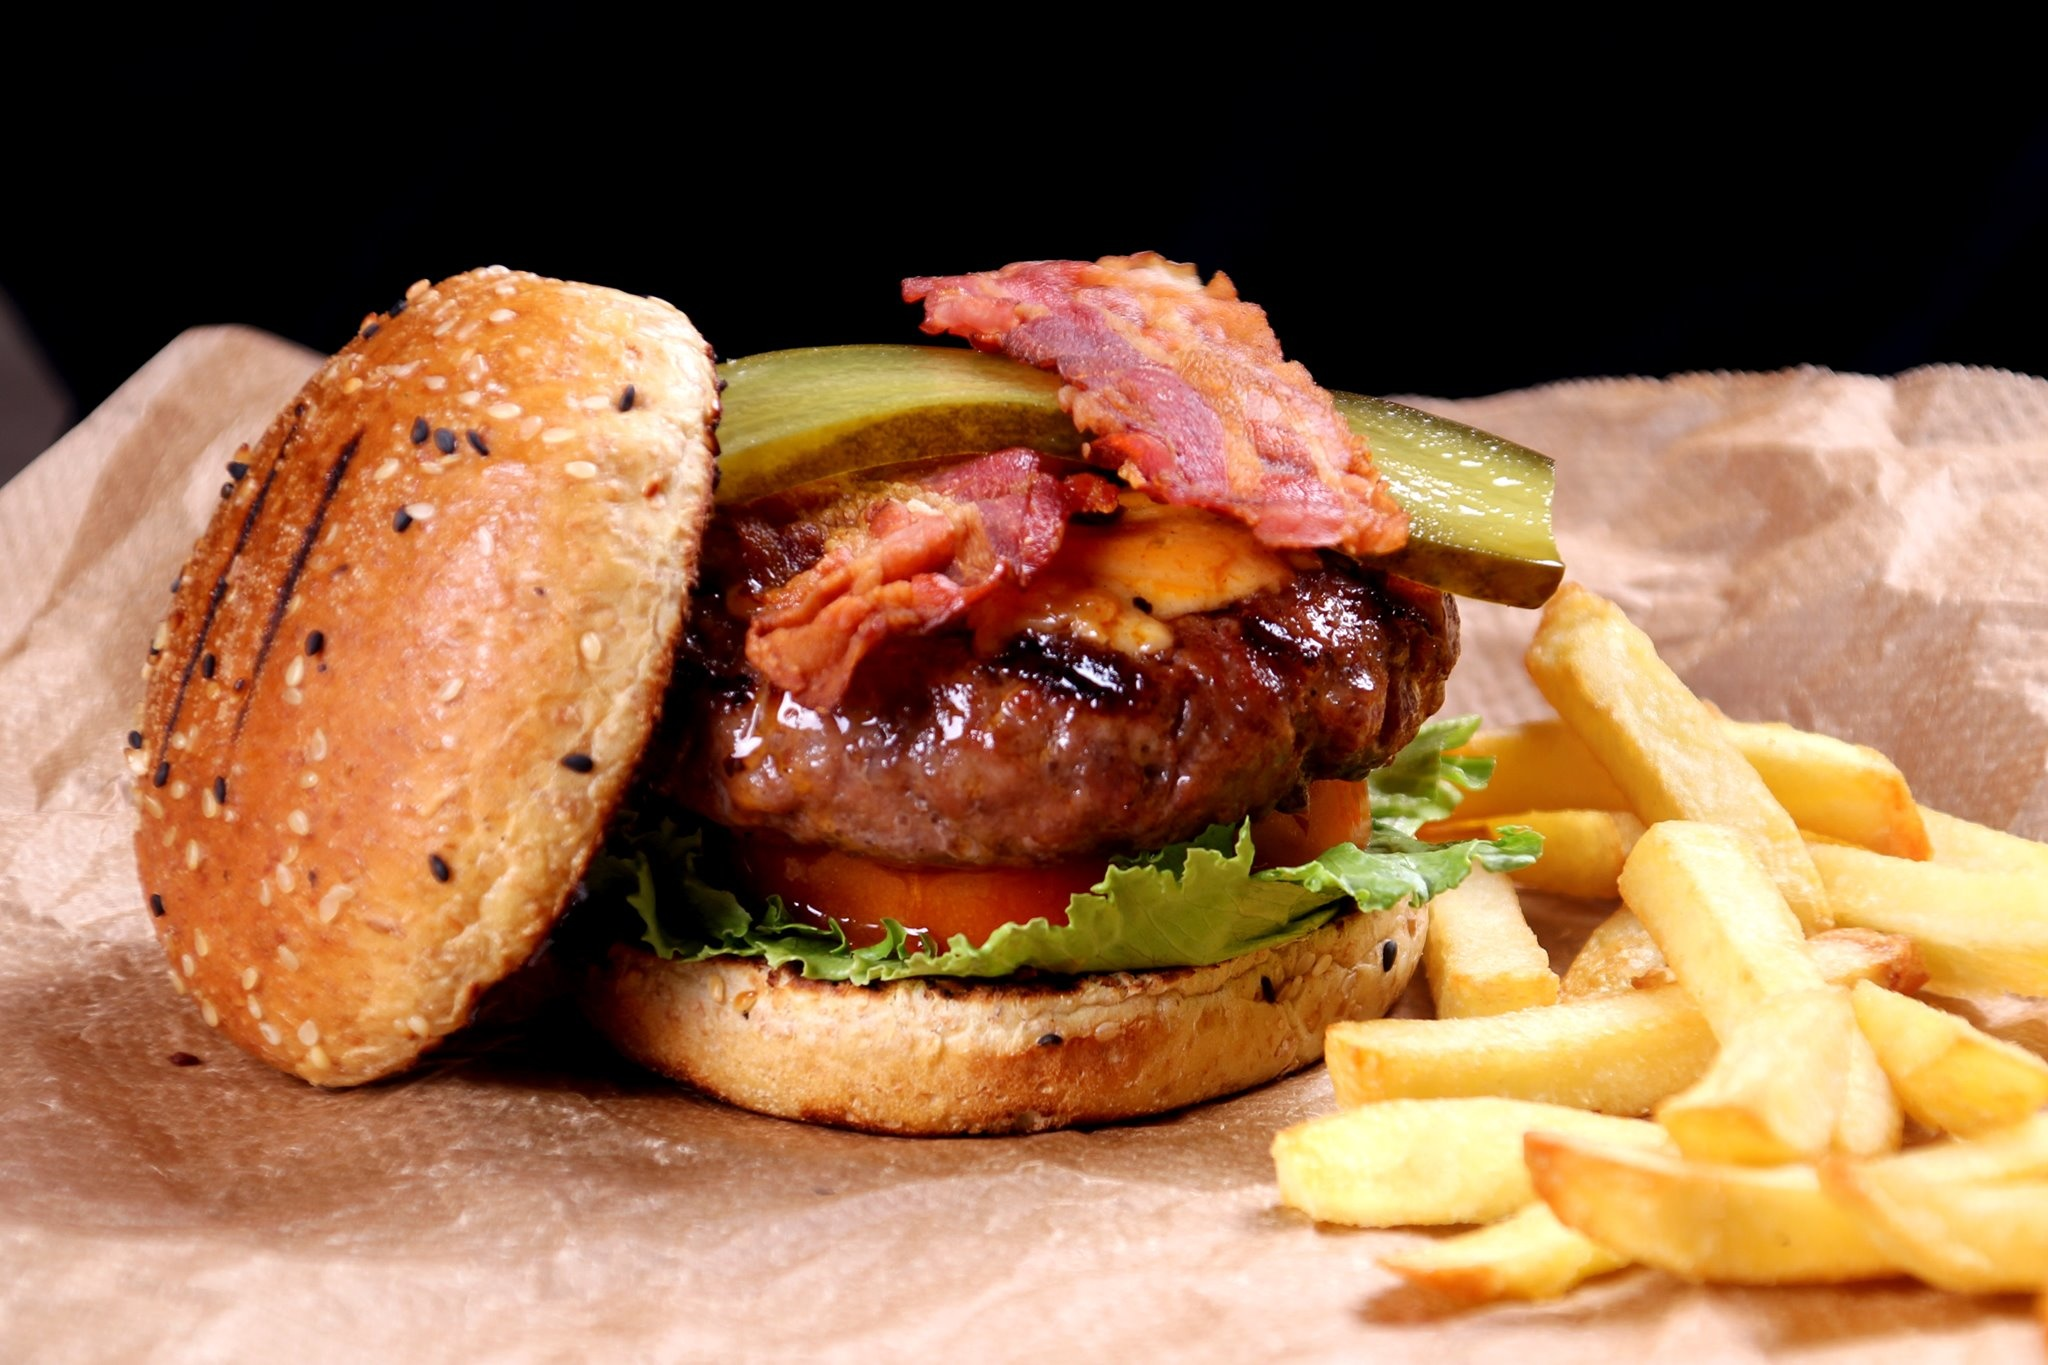 The Ultimate Big Black Angus Cheddar Jalapeño Cheese Burger